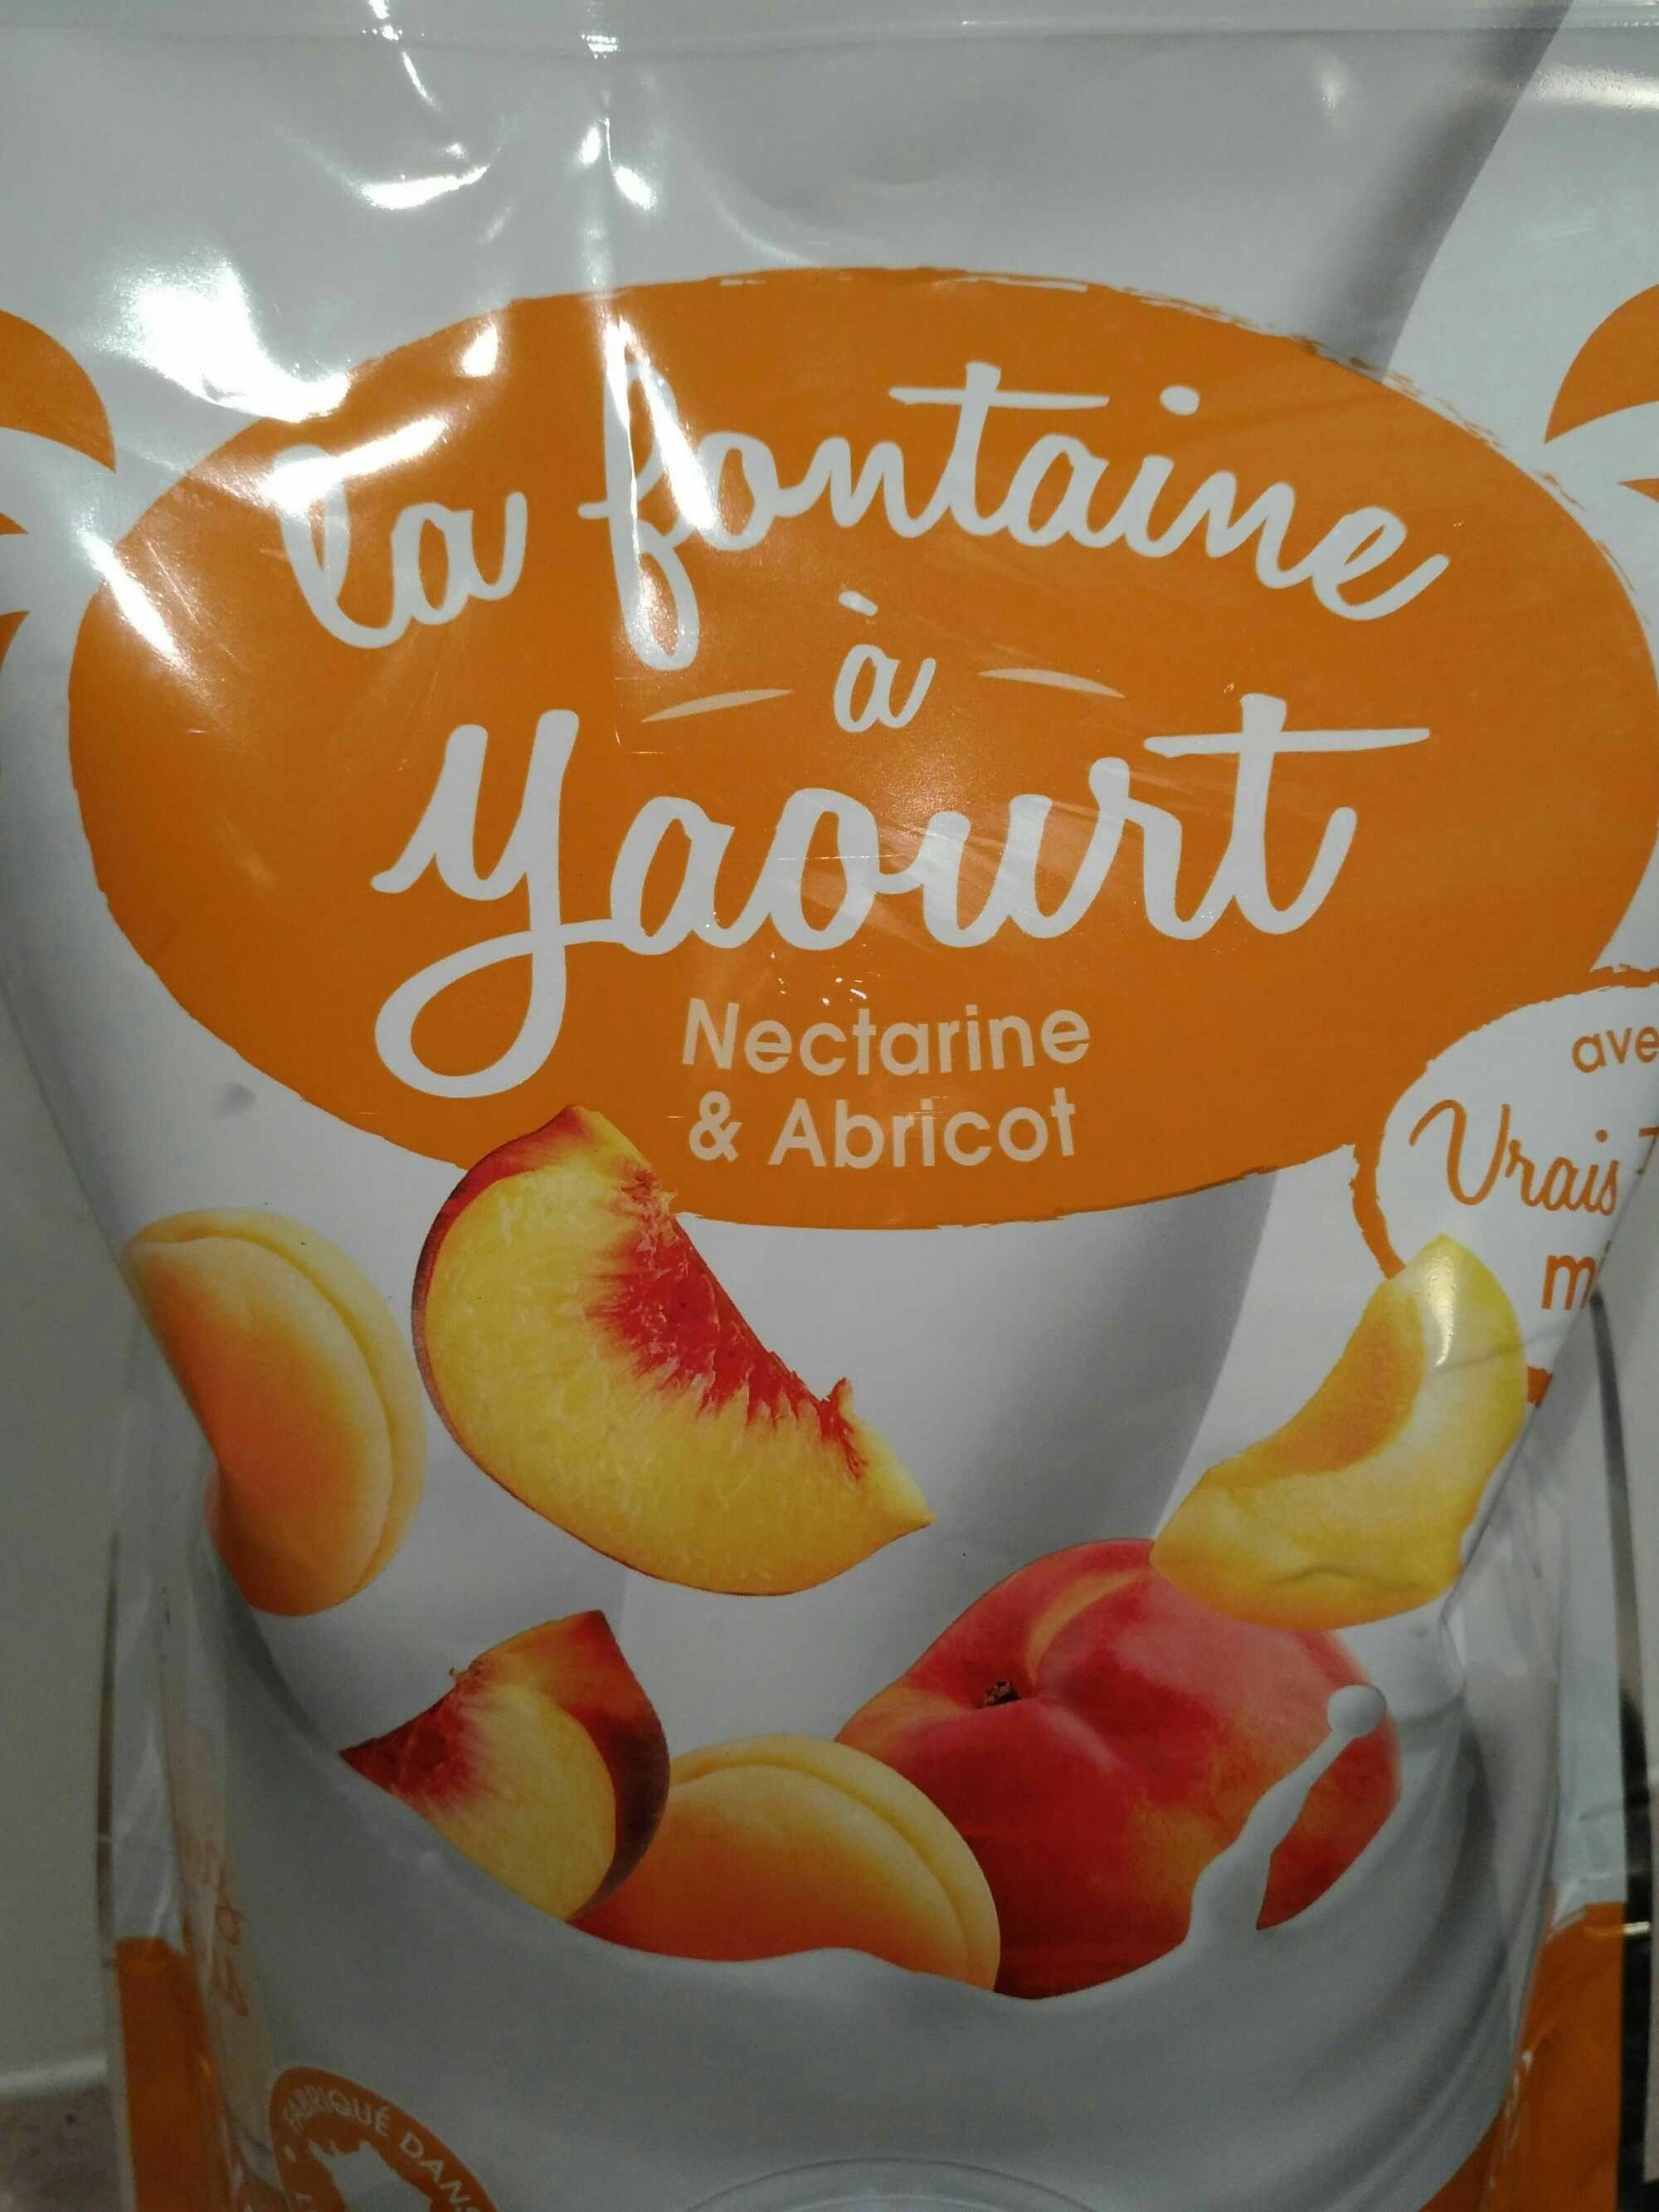 La fontaine à yaourt nectarine & abricot - Produit - fr